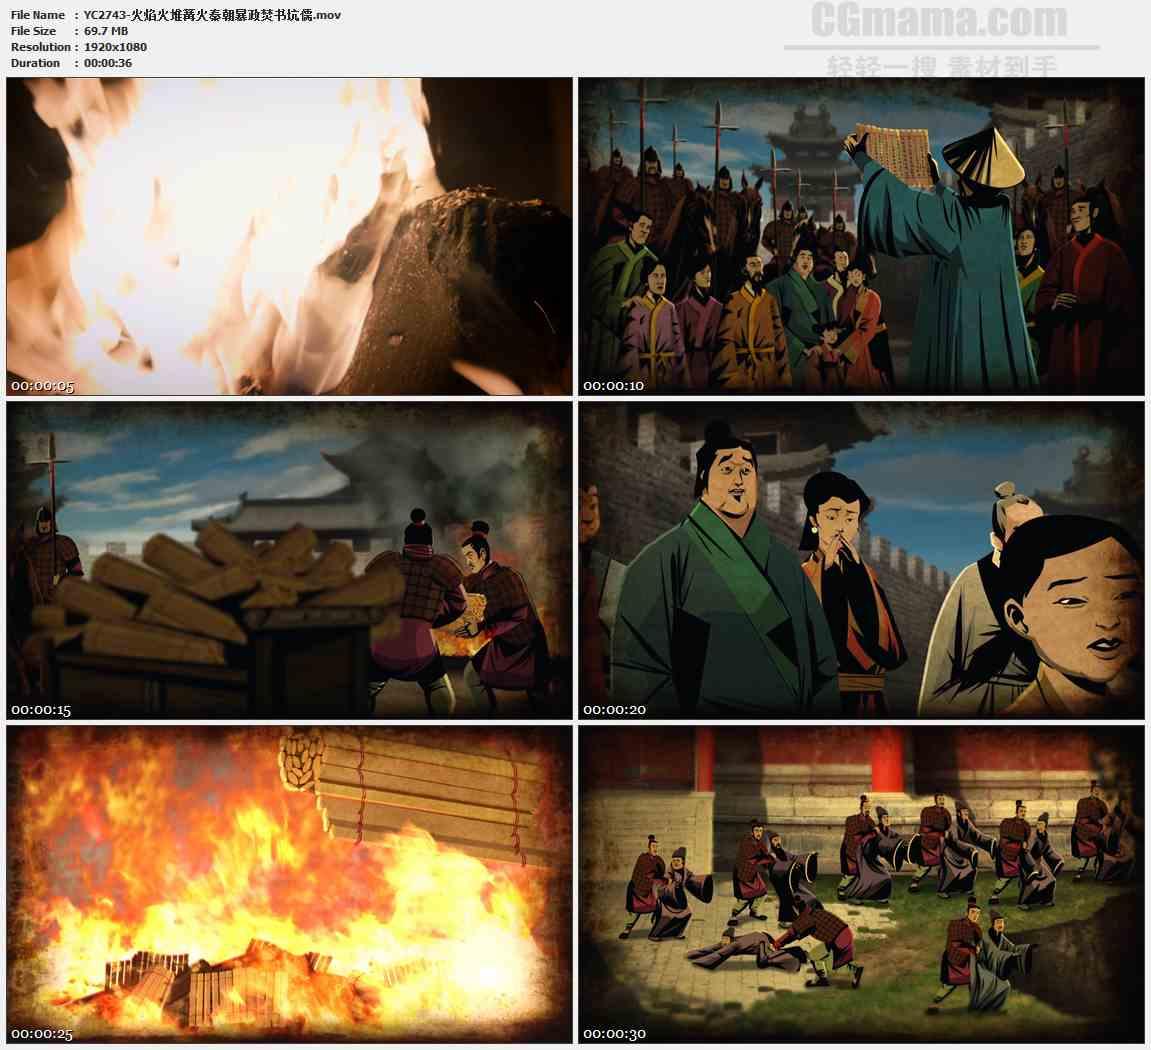 YC2743-火焰火堆篝火秦朝暴政焚书坑儒高清实拍视频素材